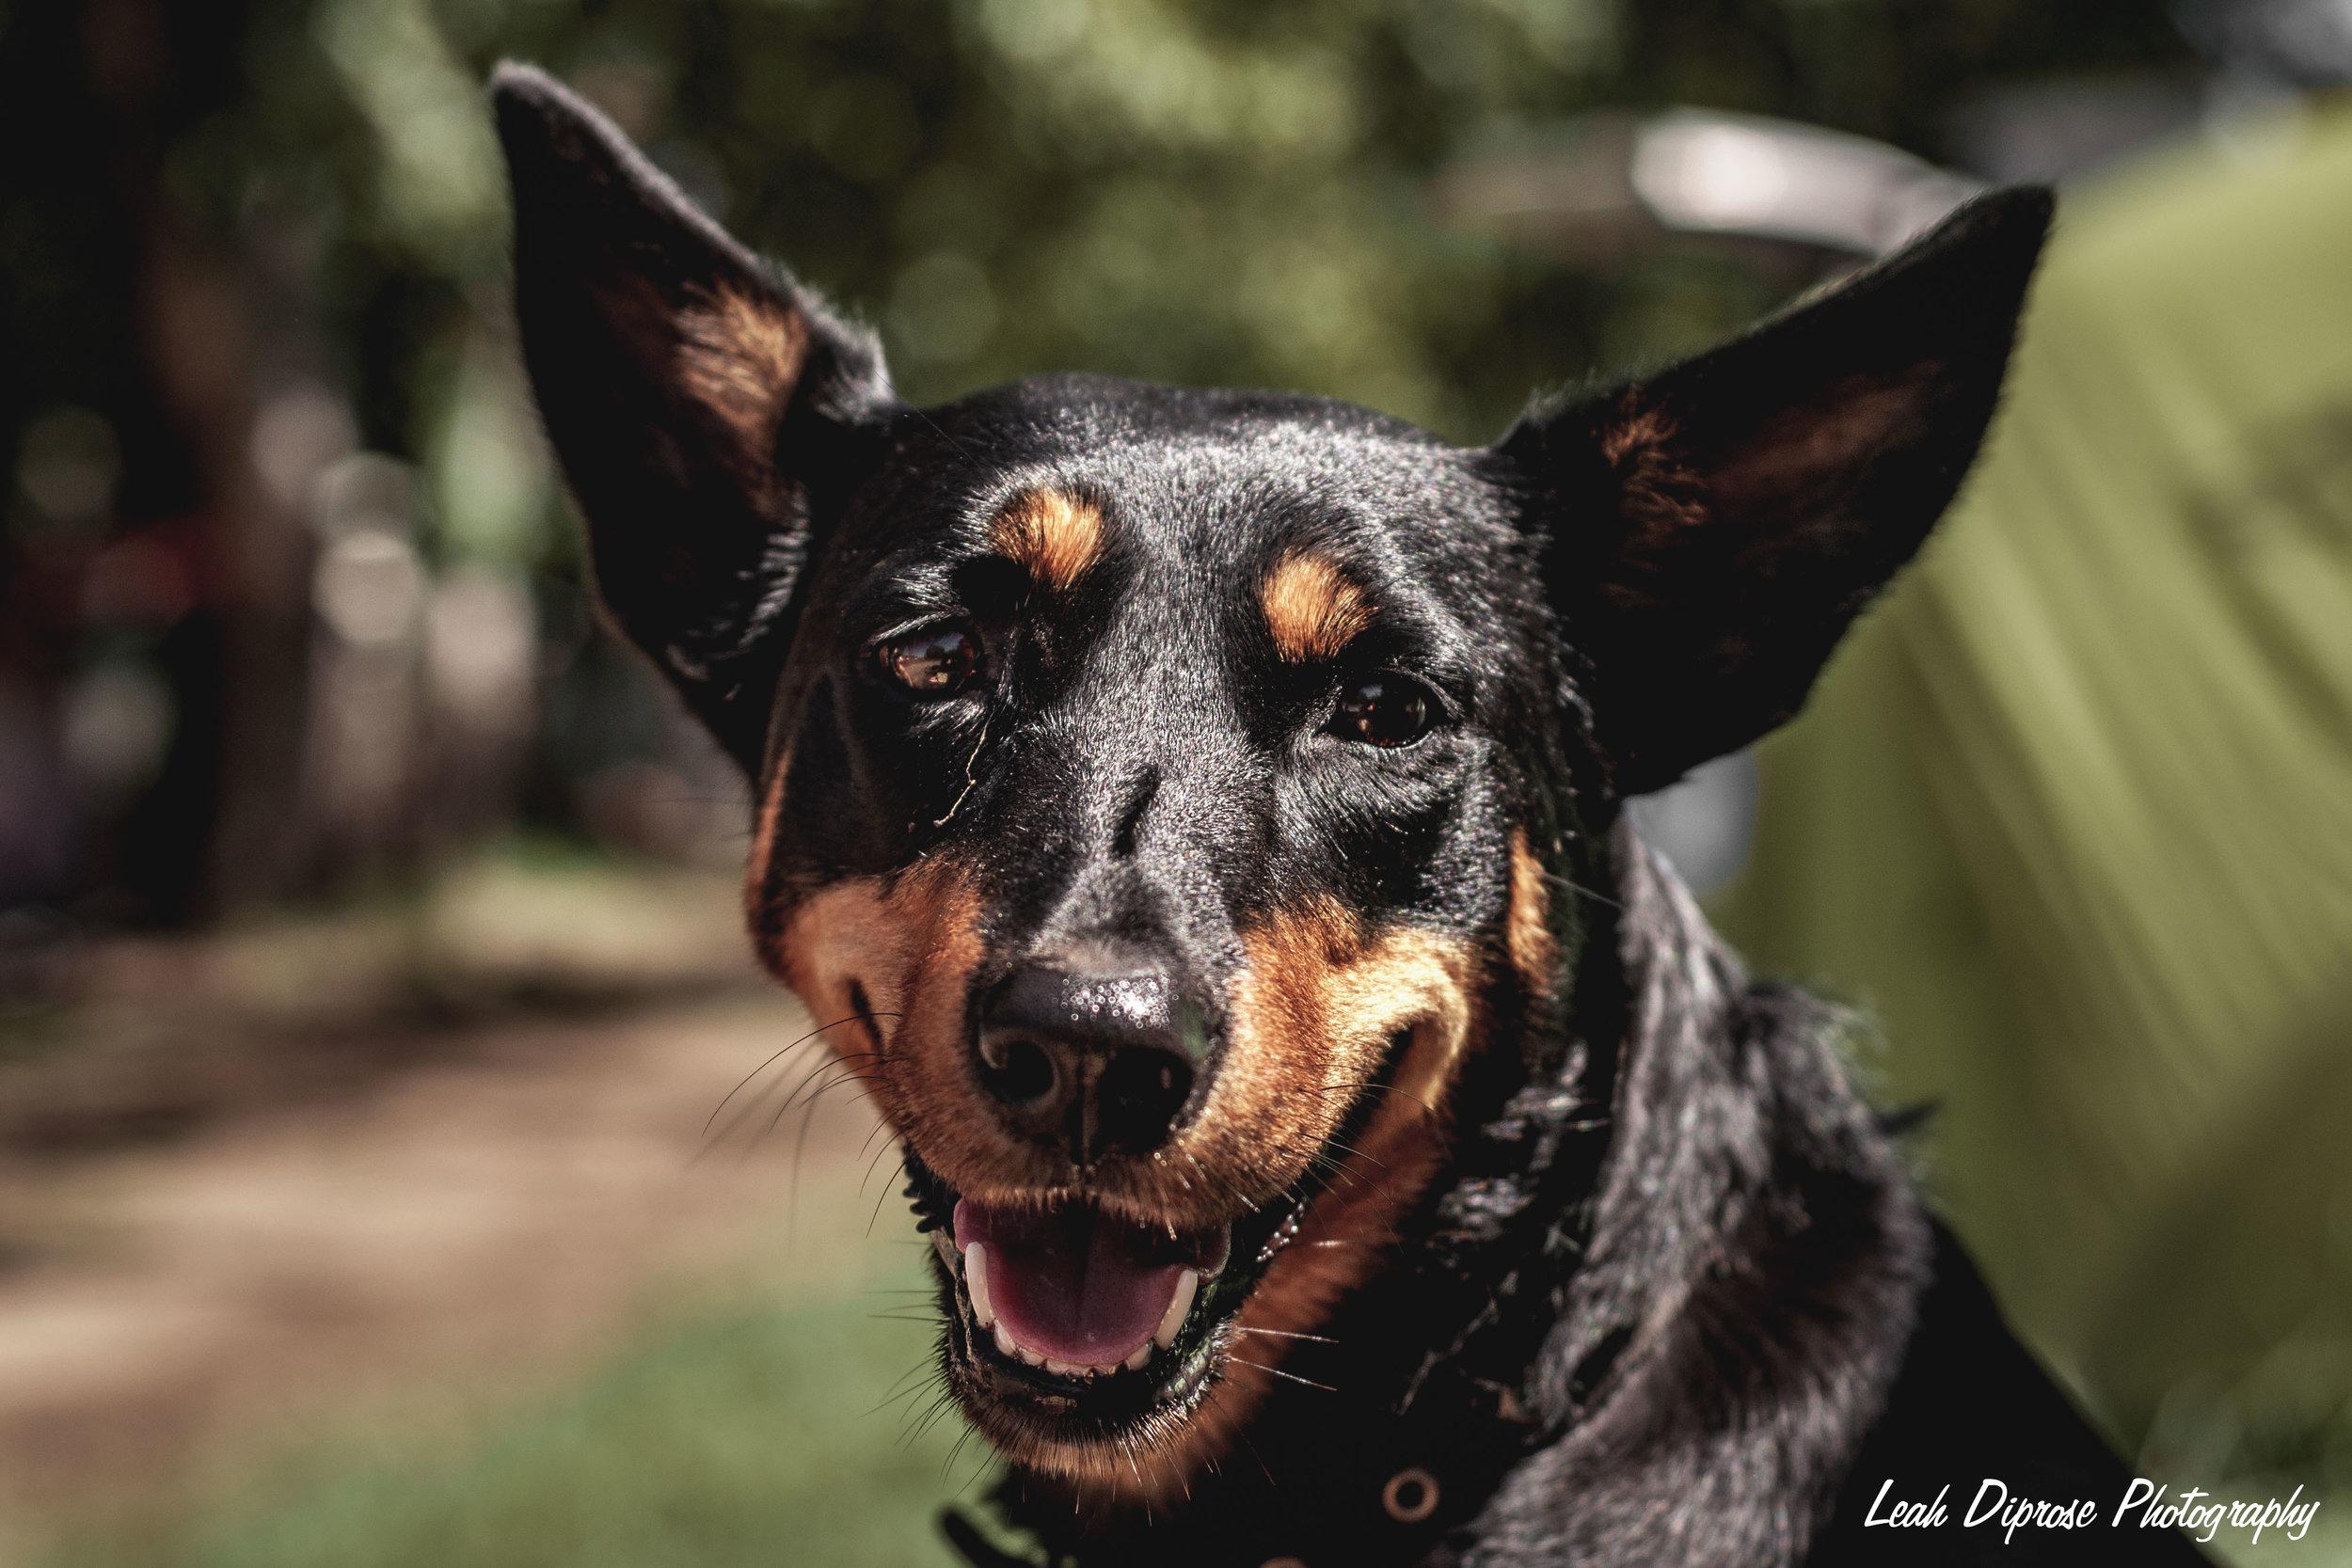 Leah Diprose Photography image-6207.jpg